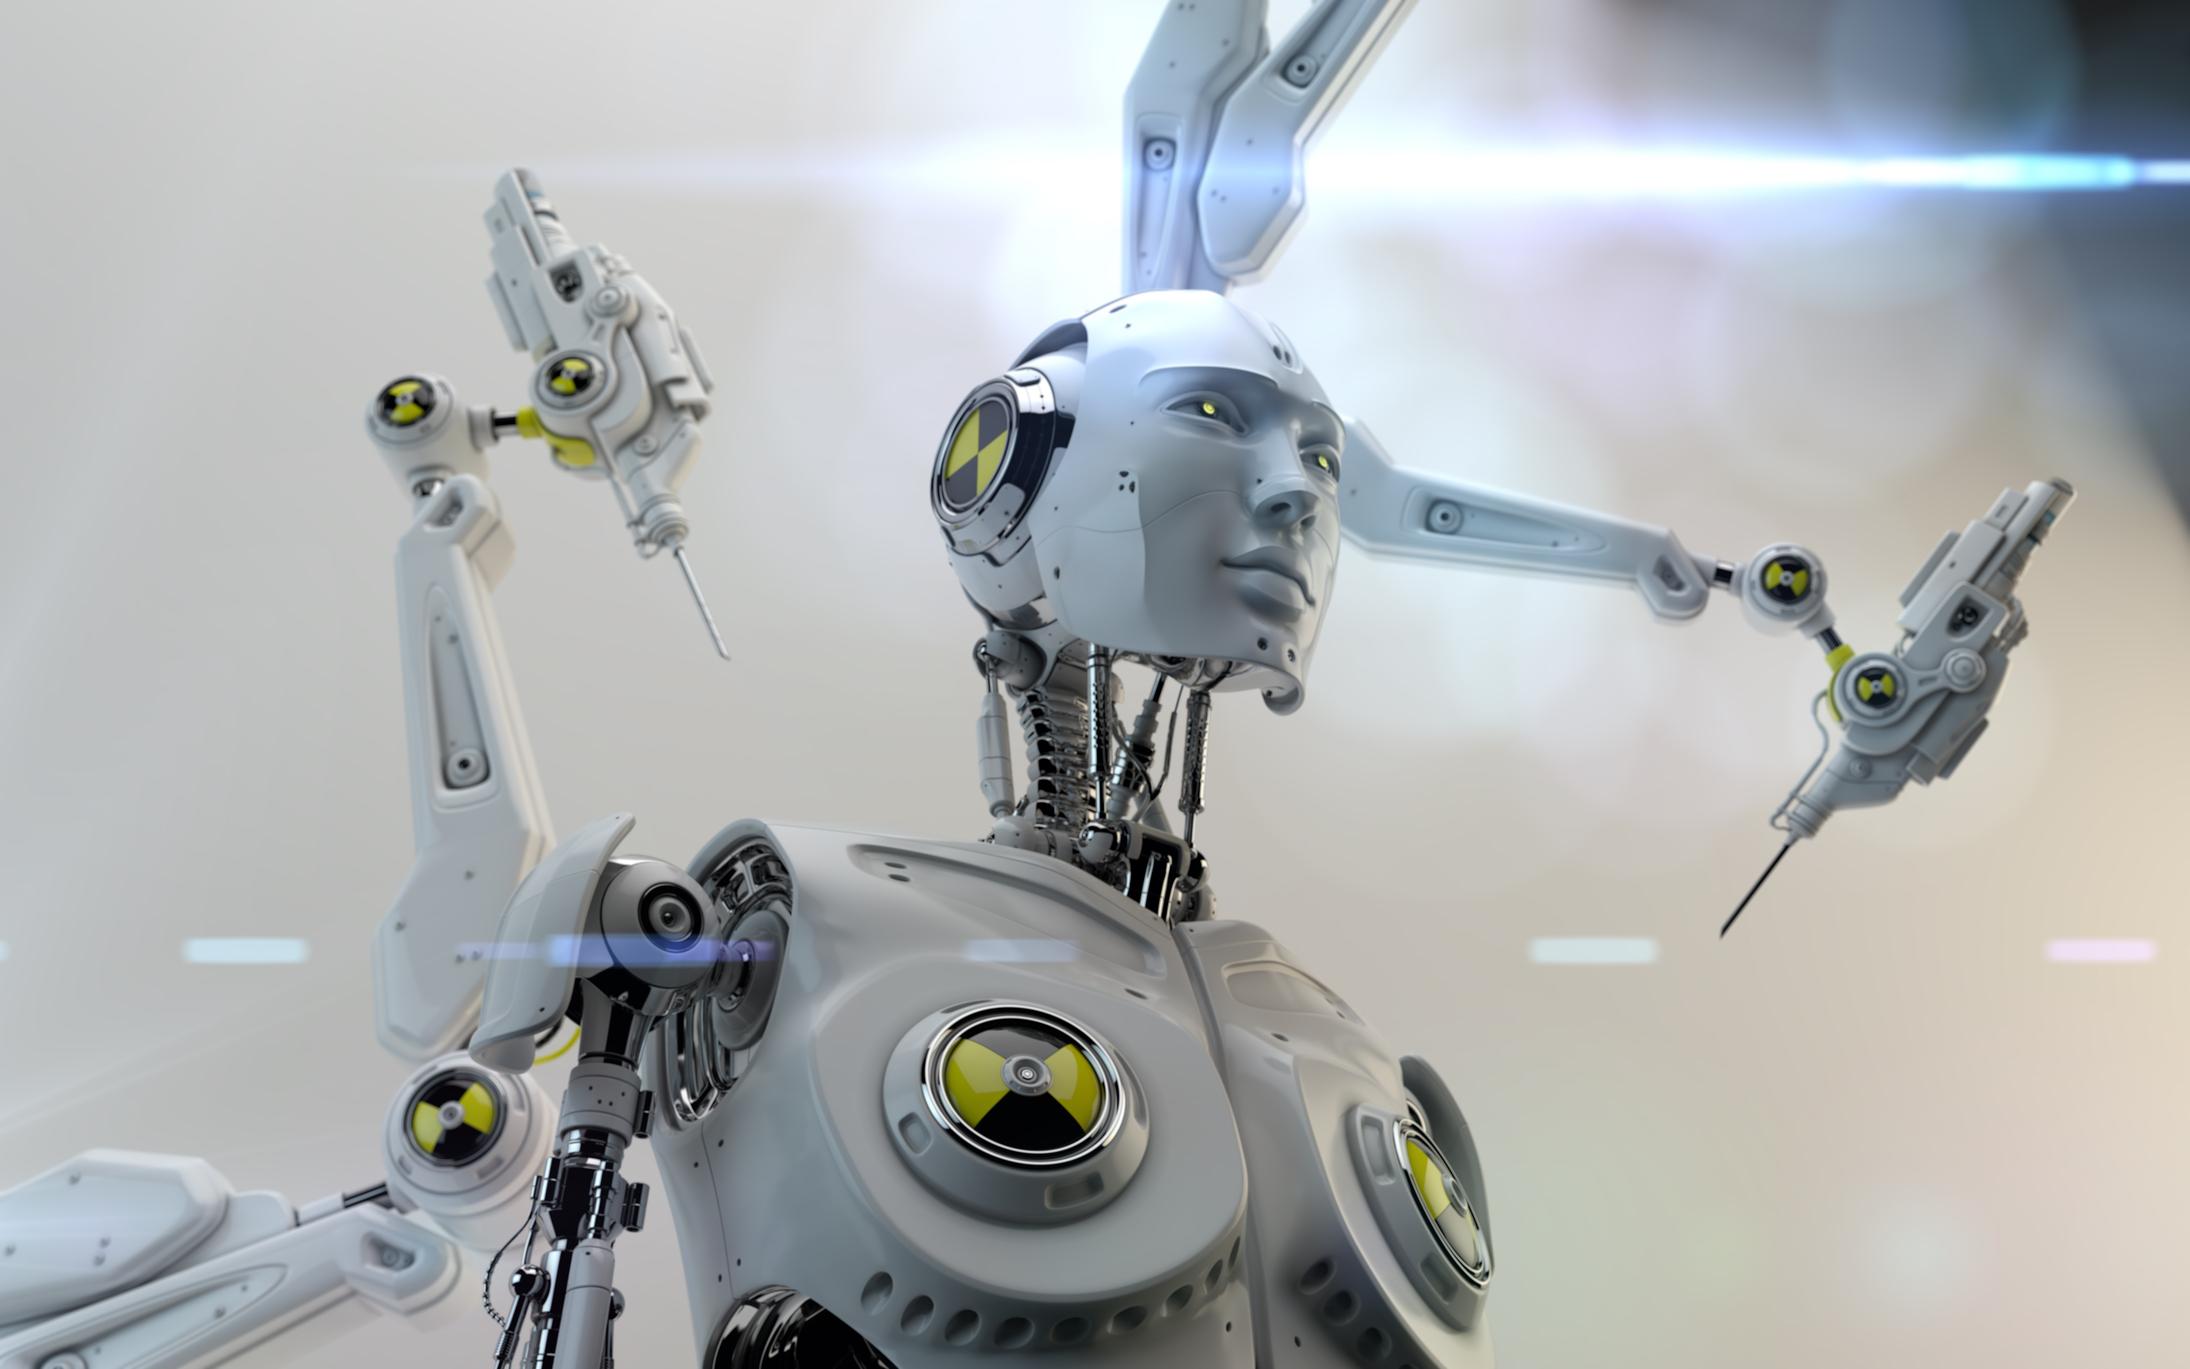 AI Robotica en Recht. Juridisch advies over Software Algoritmes, Machine Learning, Privacy & Ethiek